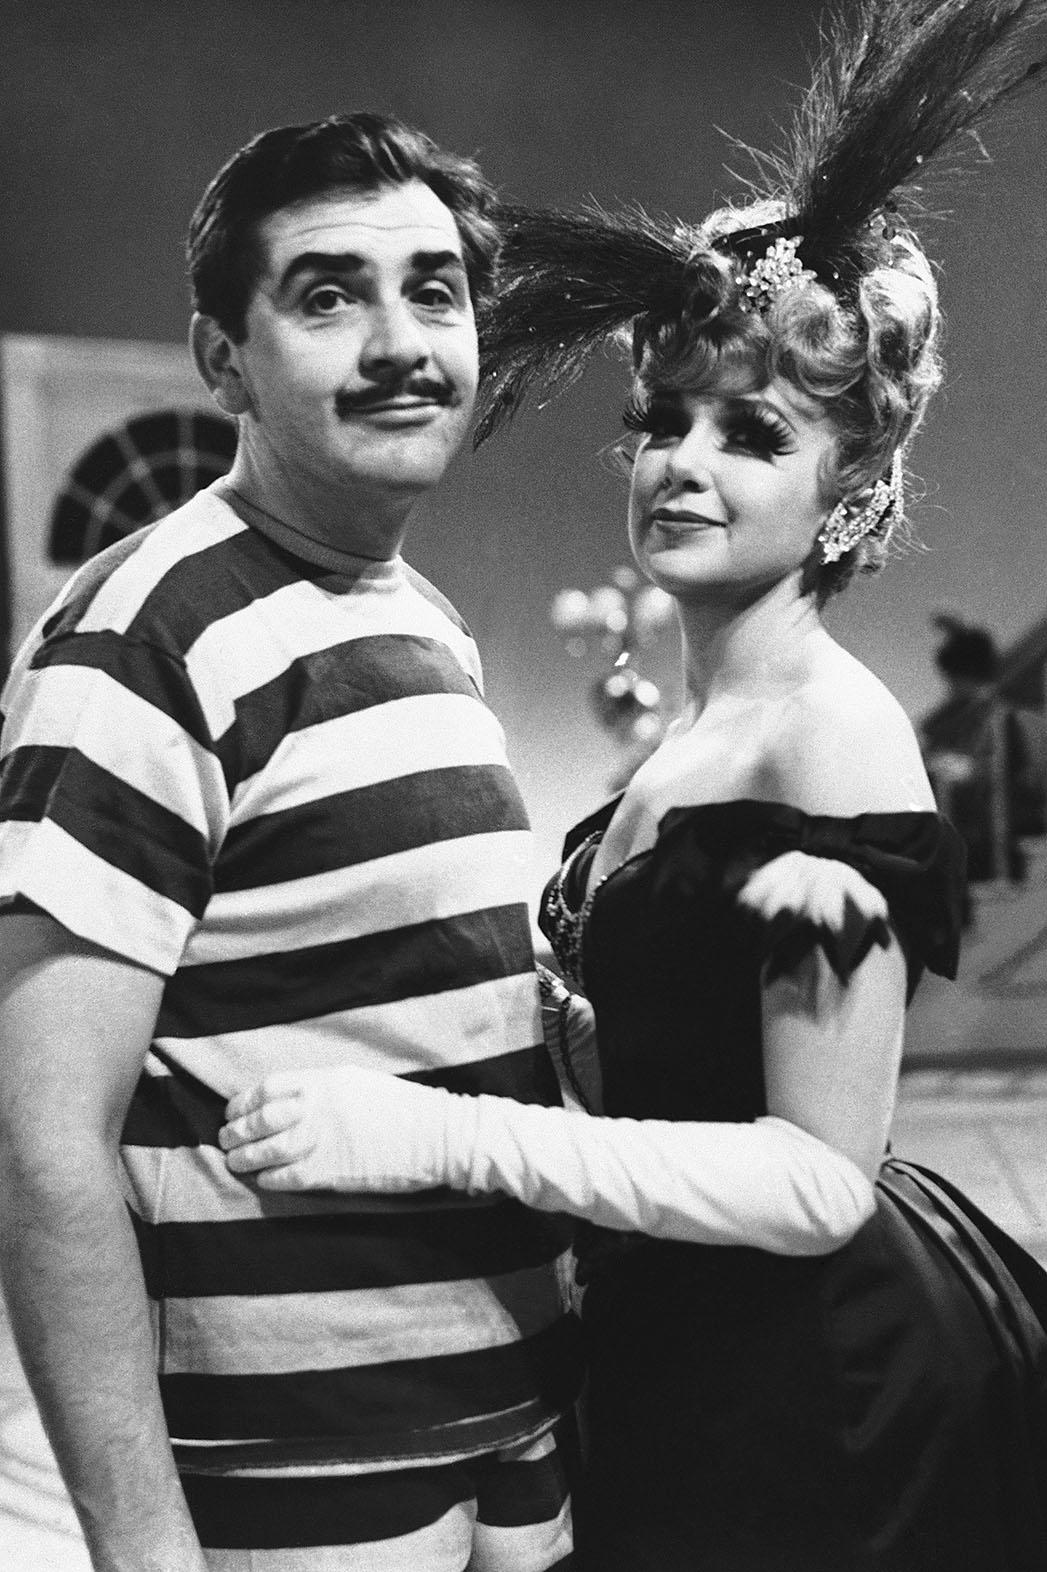 Ernie Kovacs and Edie Adams - P 2015